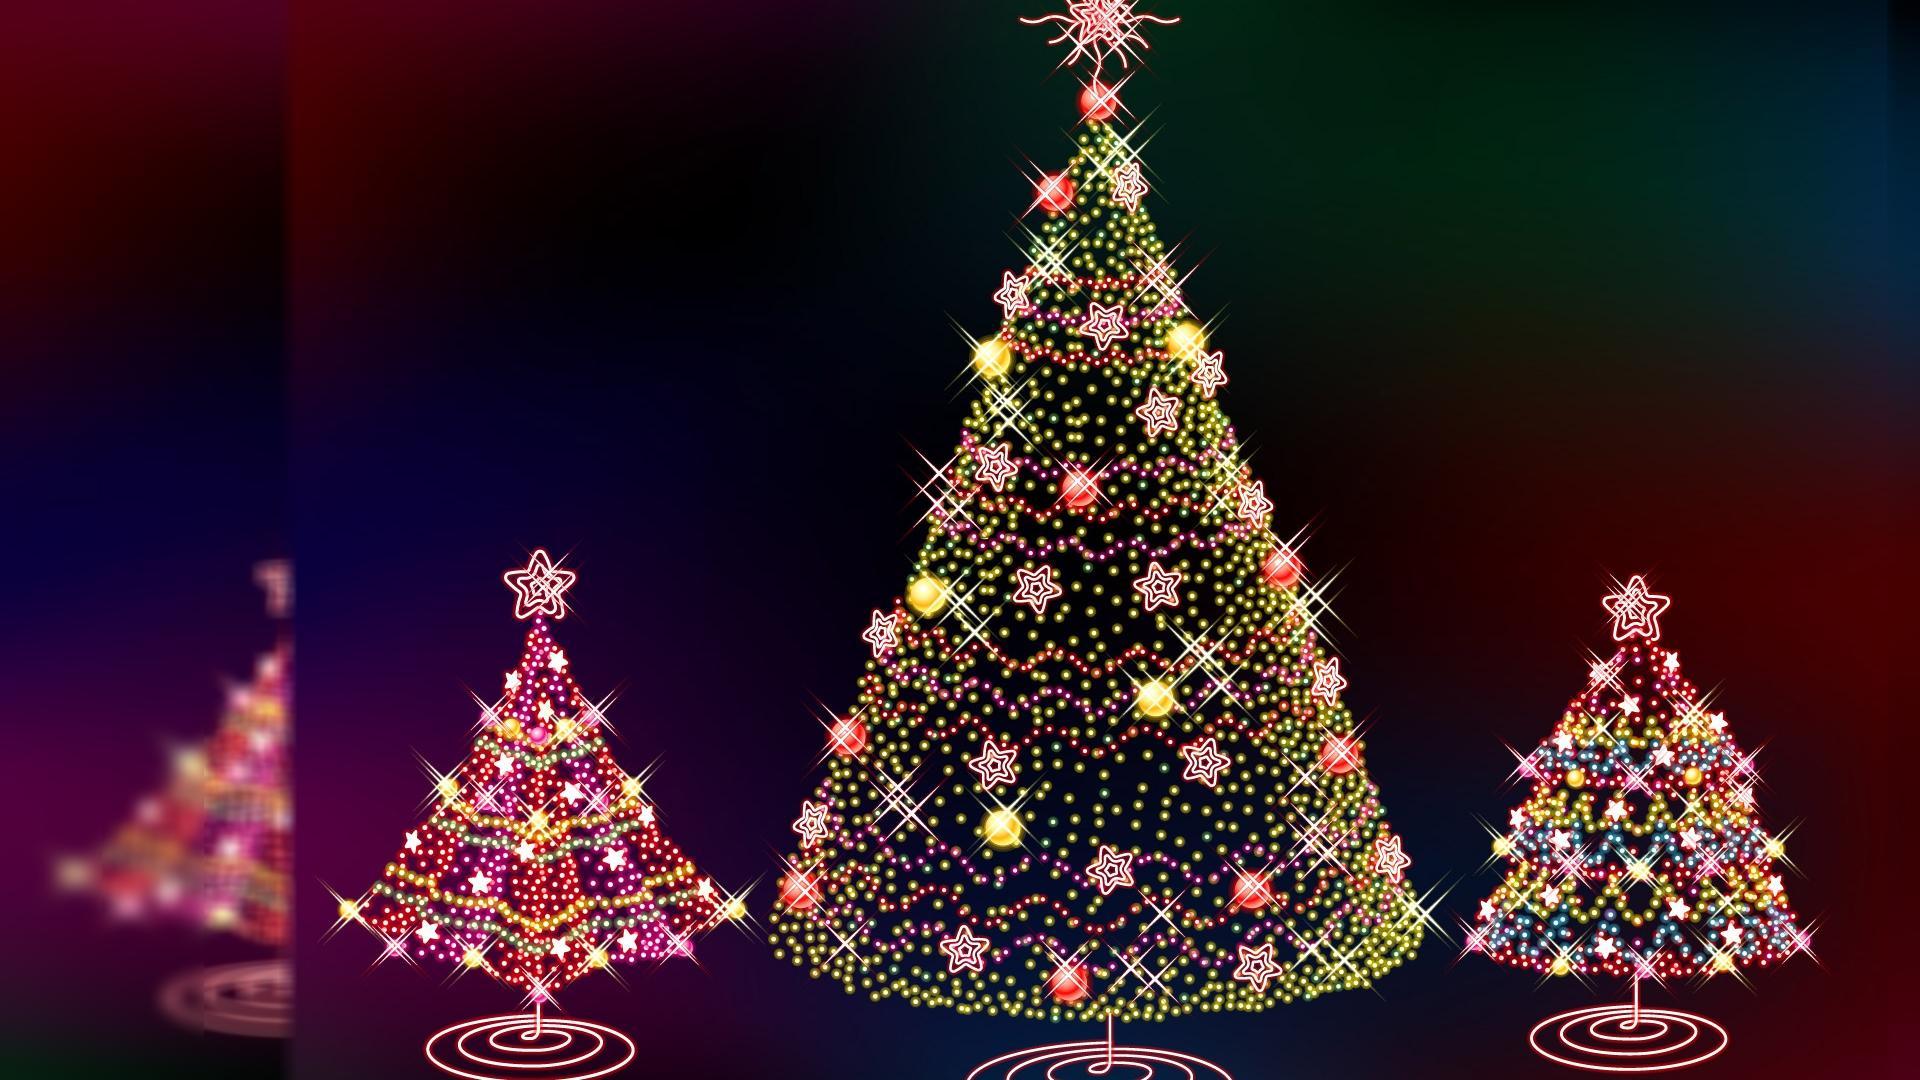 Download Christmas Desktop Wallpaper 50   Wallpaper 1920x1080